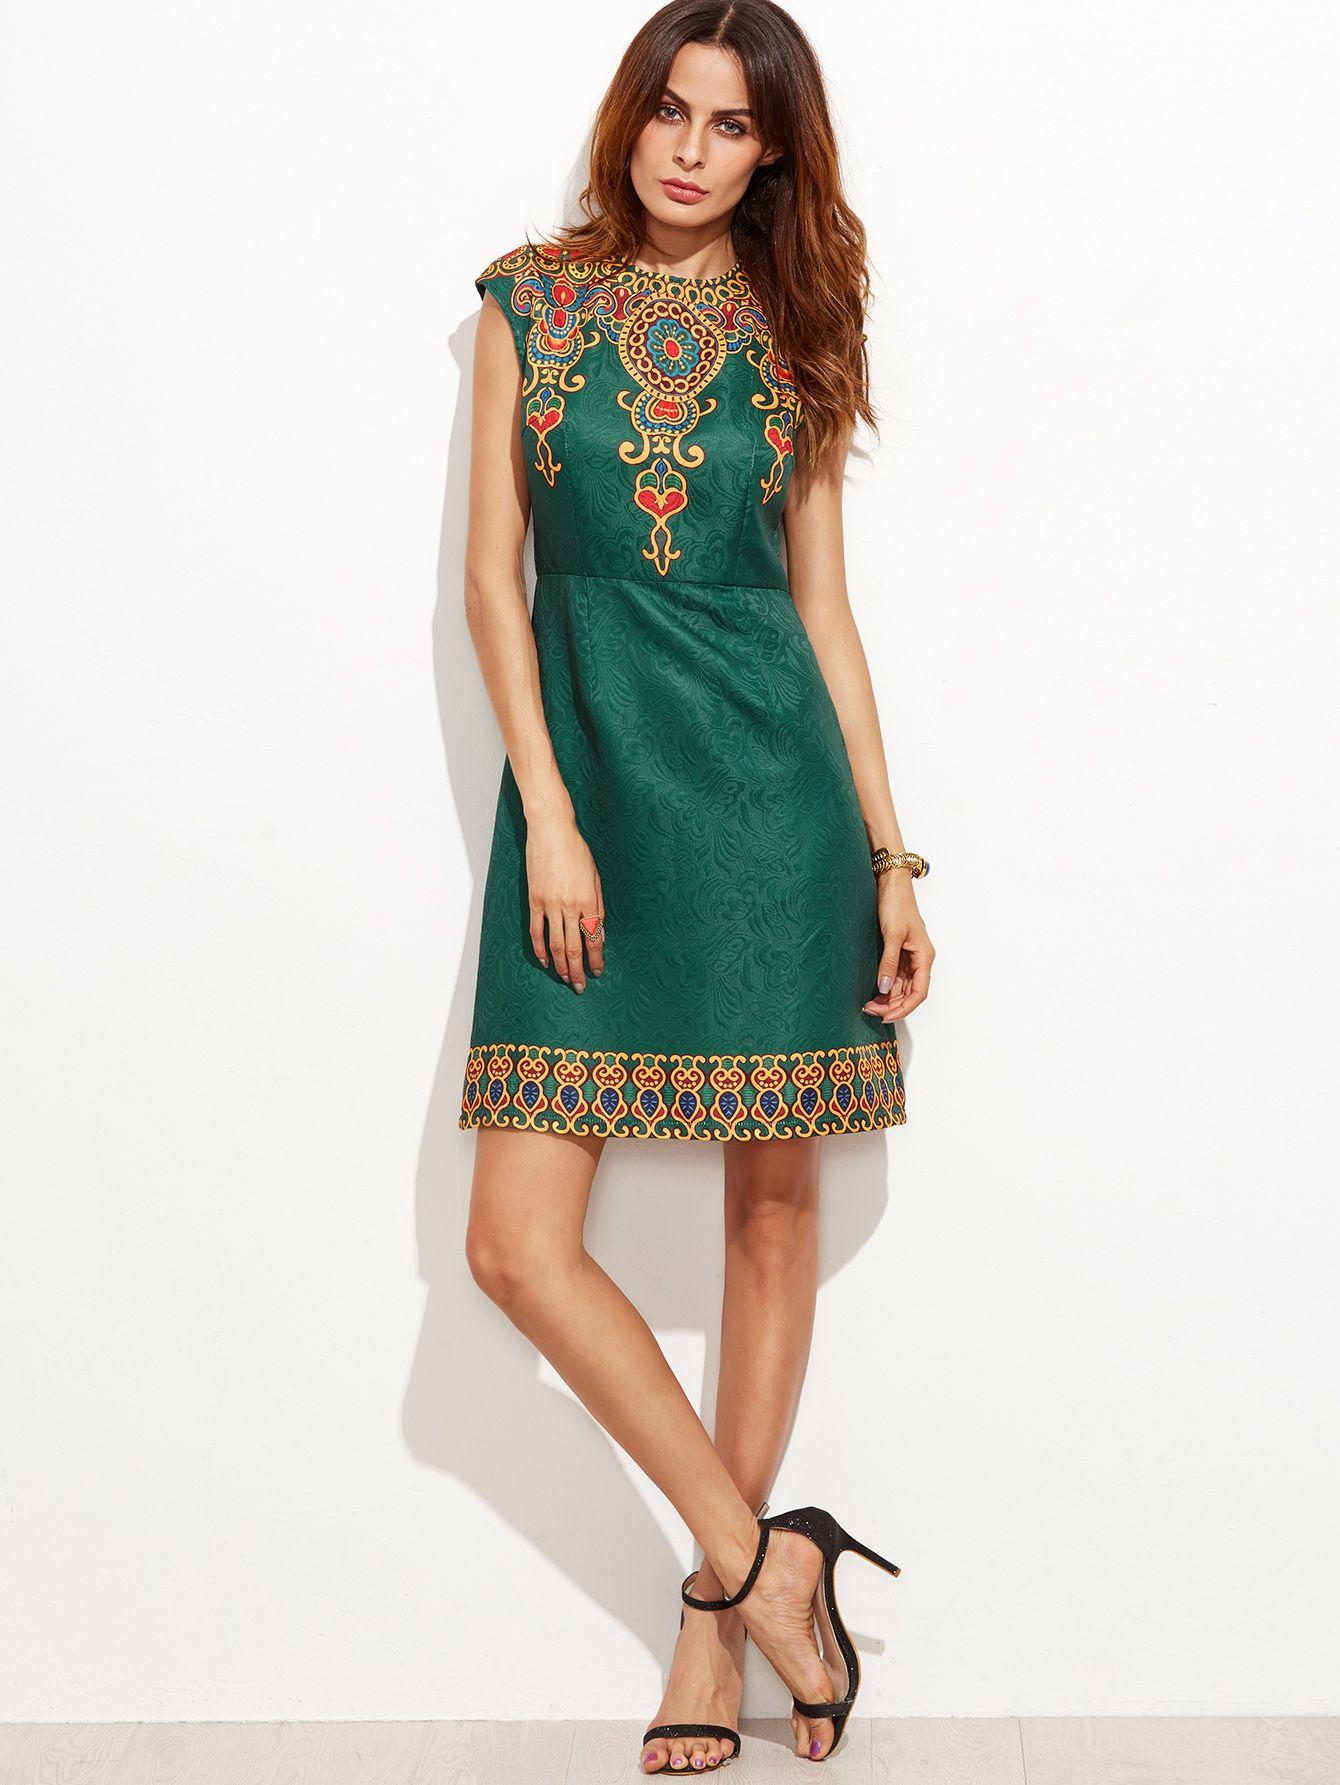 a986d95d3bf3 Green Vintage Print Cap Sleeve Jacquard Dress -SheIn(Sheinside ...